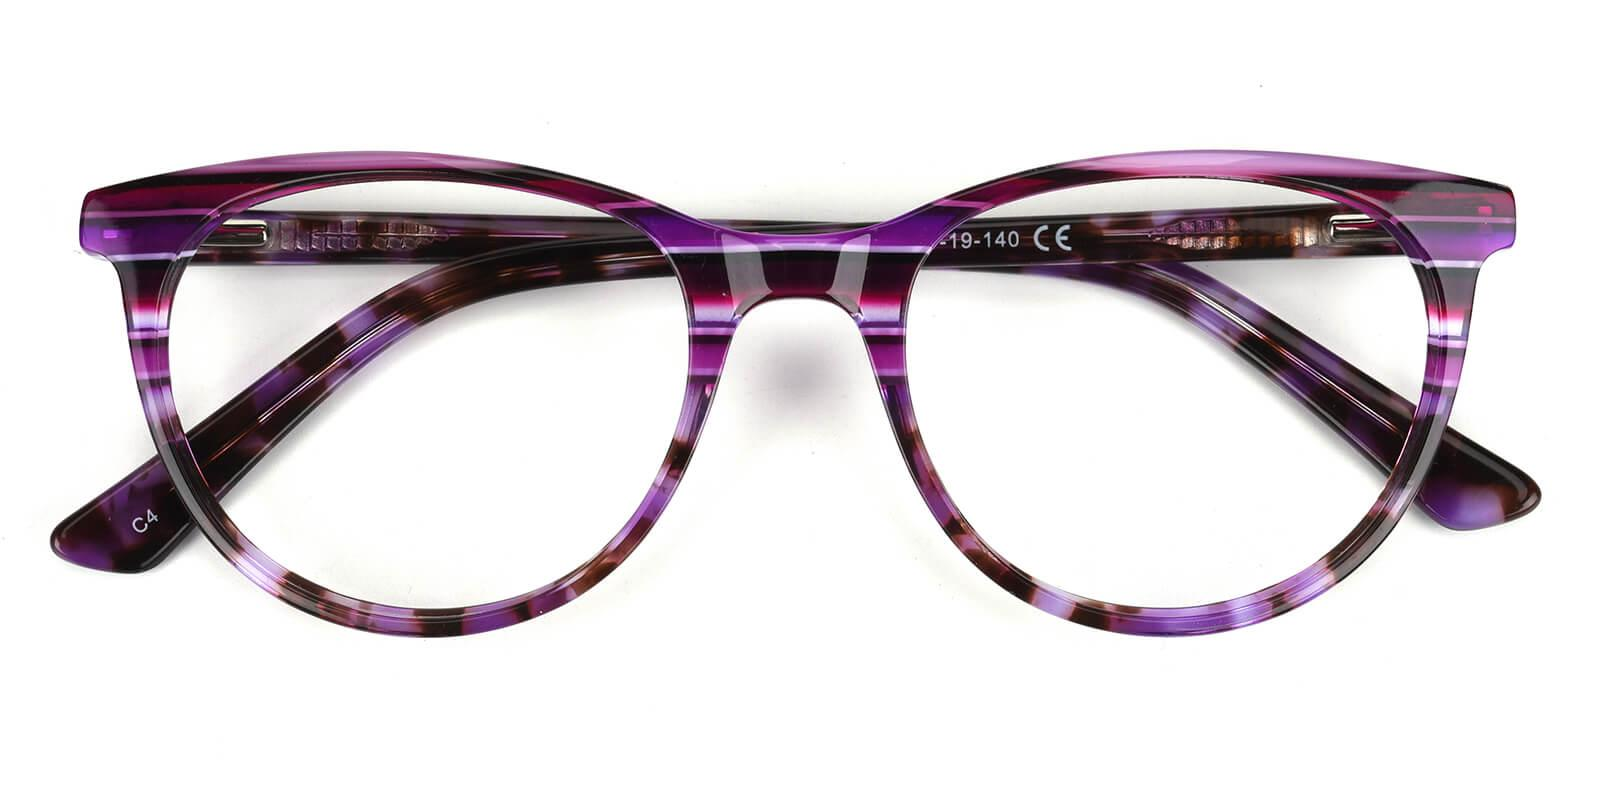 Lankas-Purple-Cat-Acetate-Eyeglasses-detail